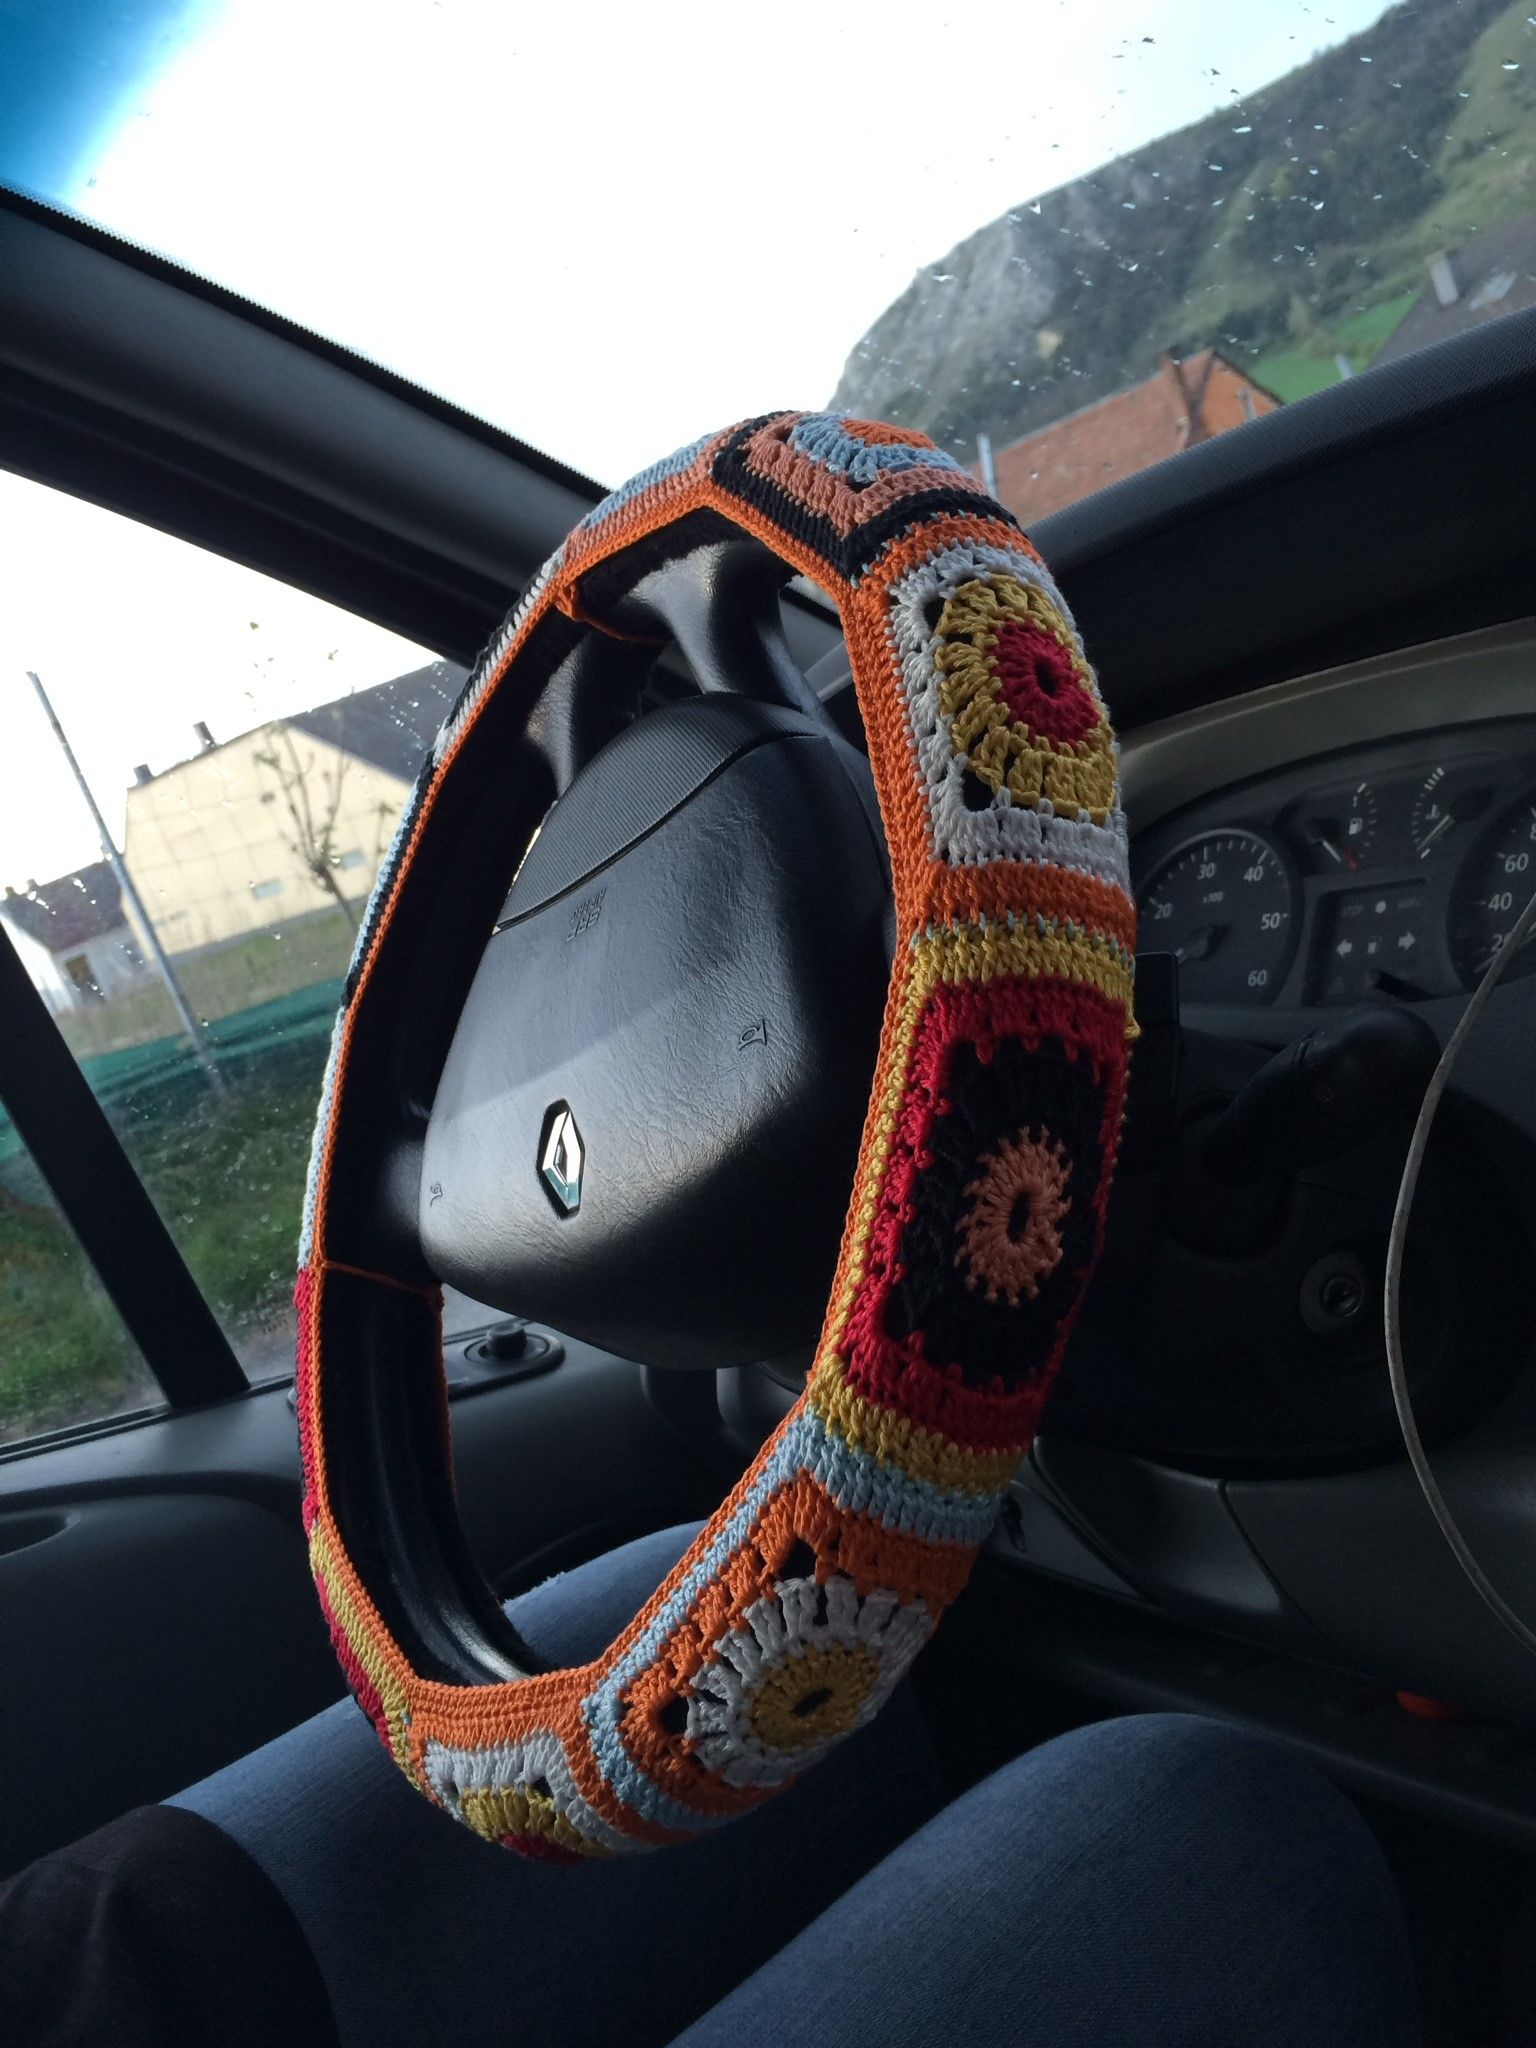 Häkeln crocheting crochet lenkrad autp diy wolle | DIY | Pinterest ...